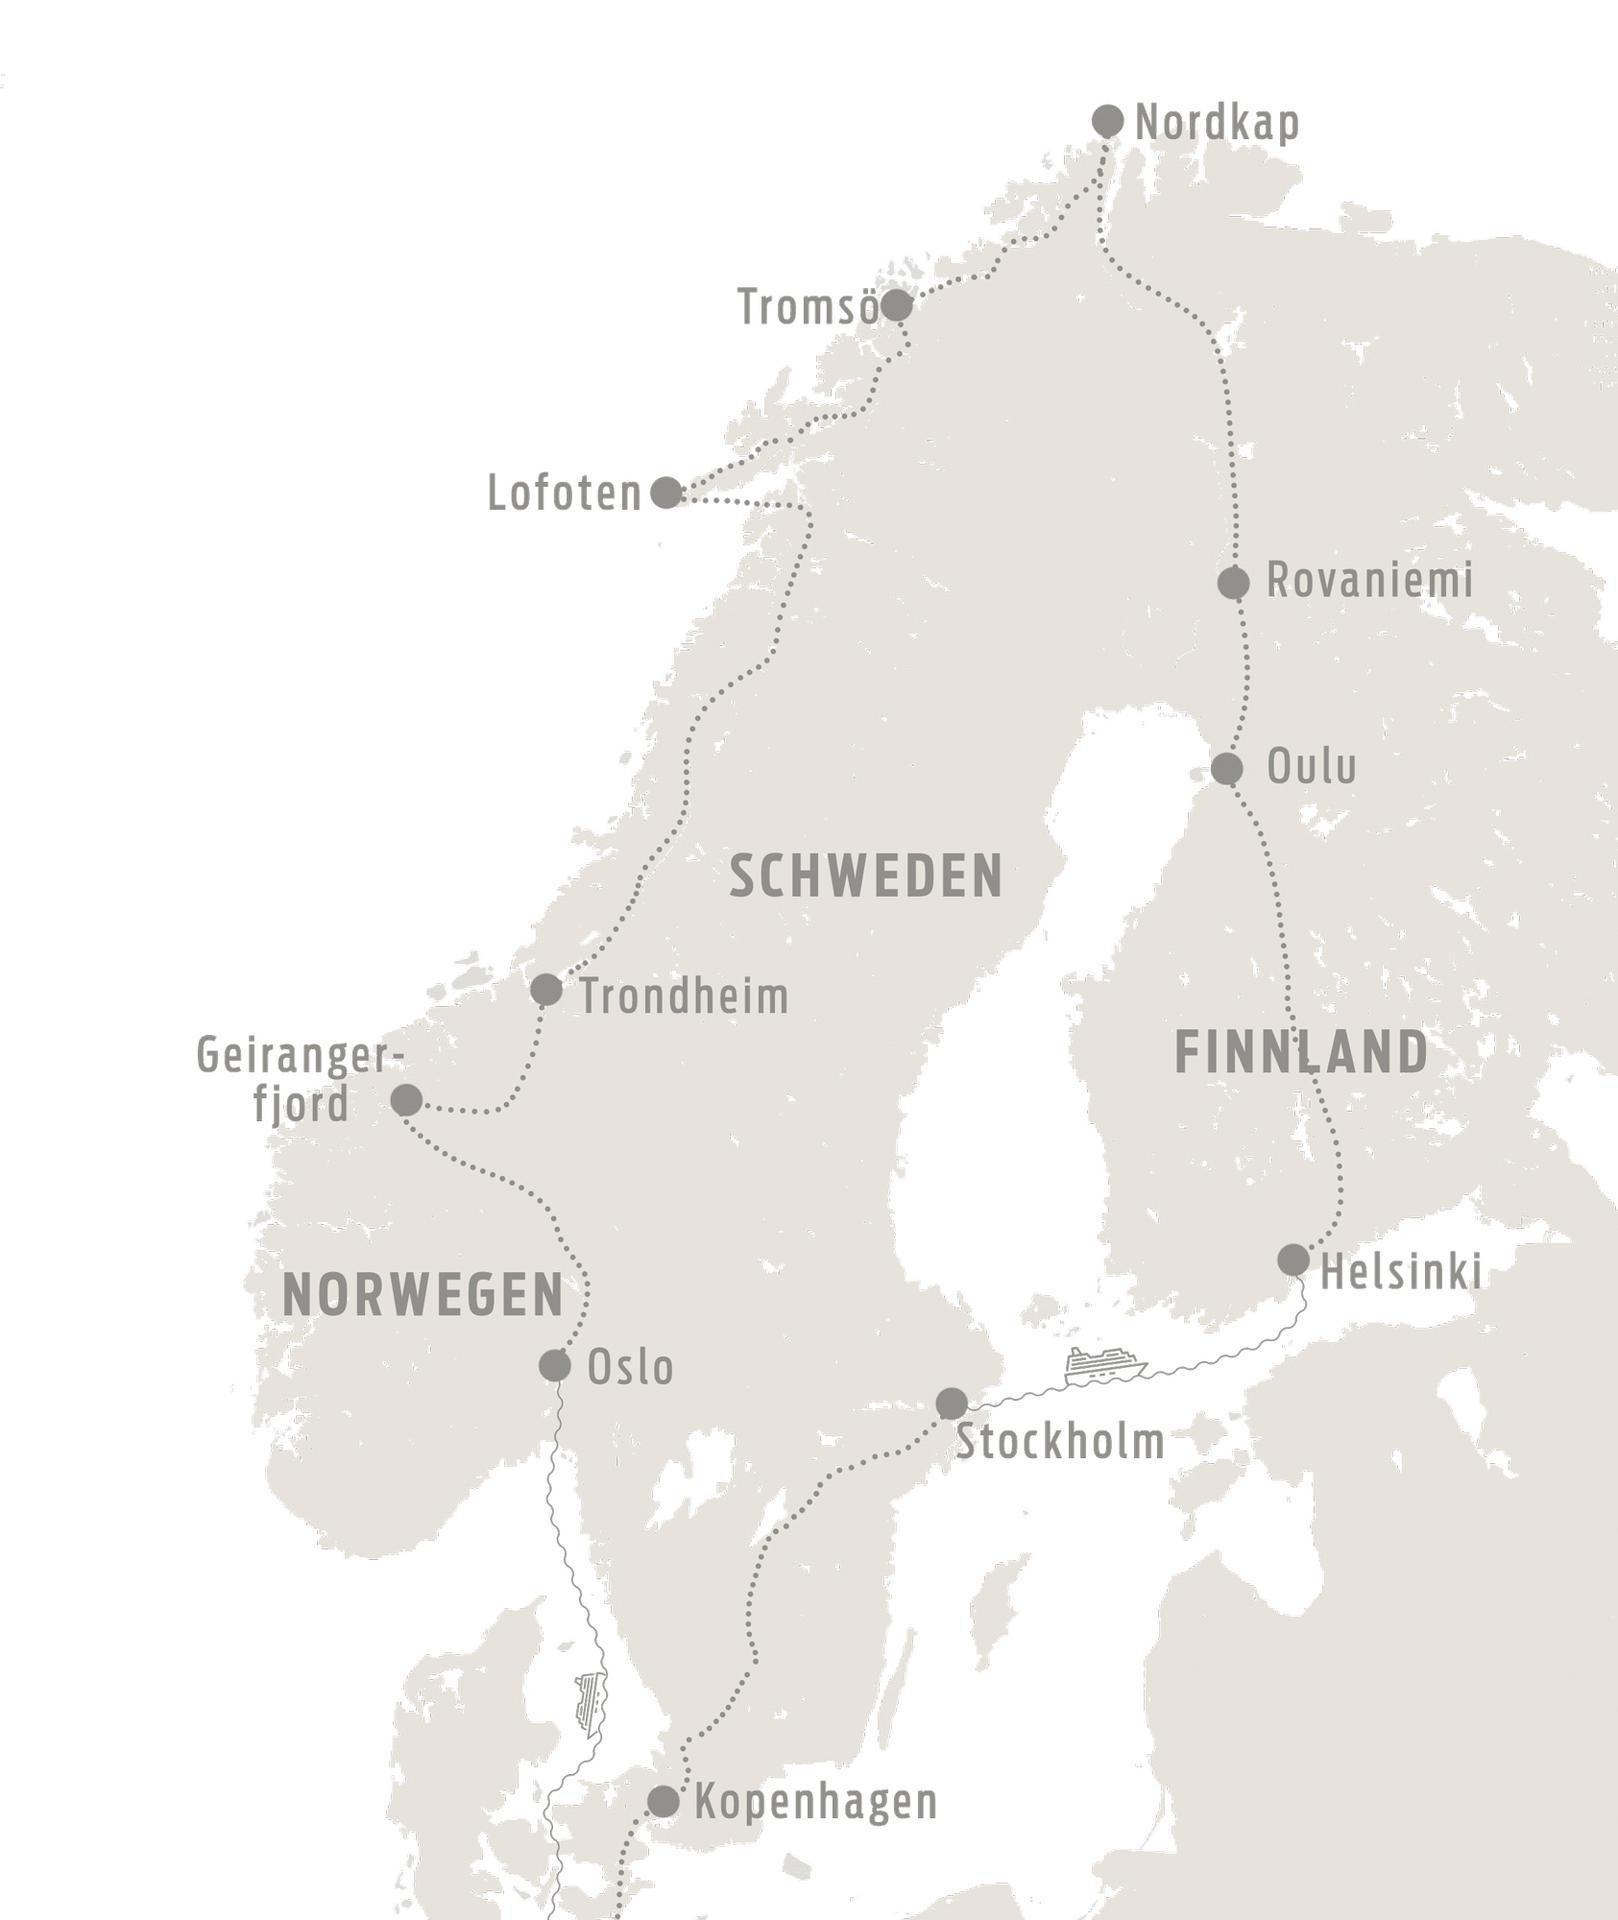 Karte Nordkap 2020 web